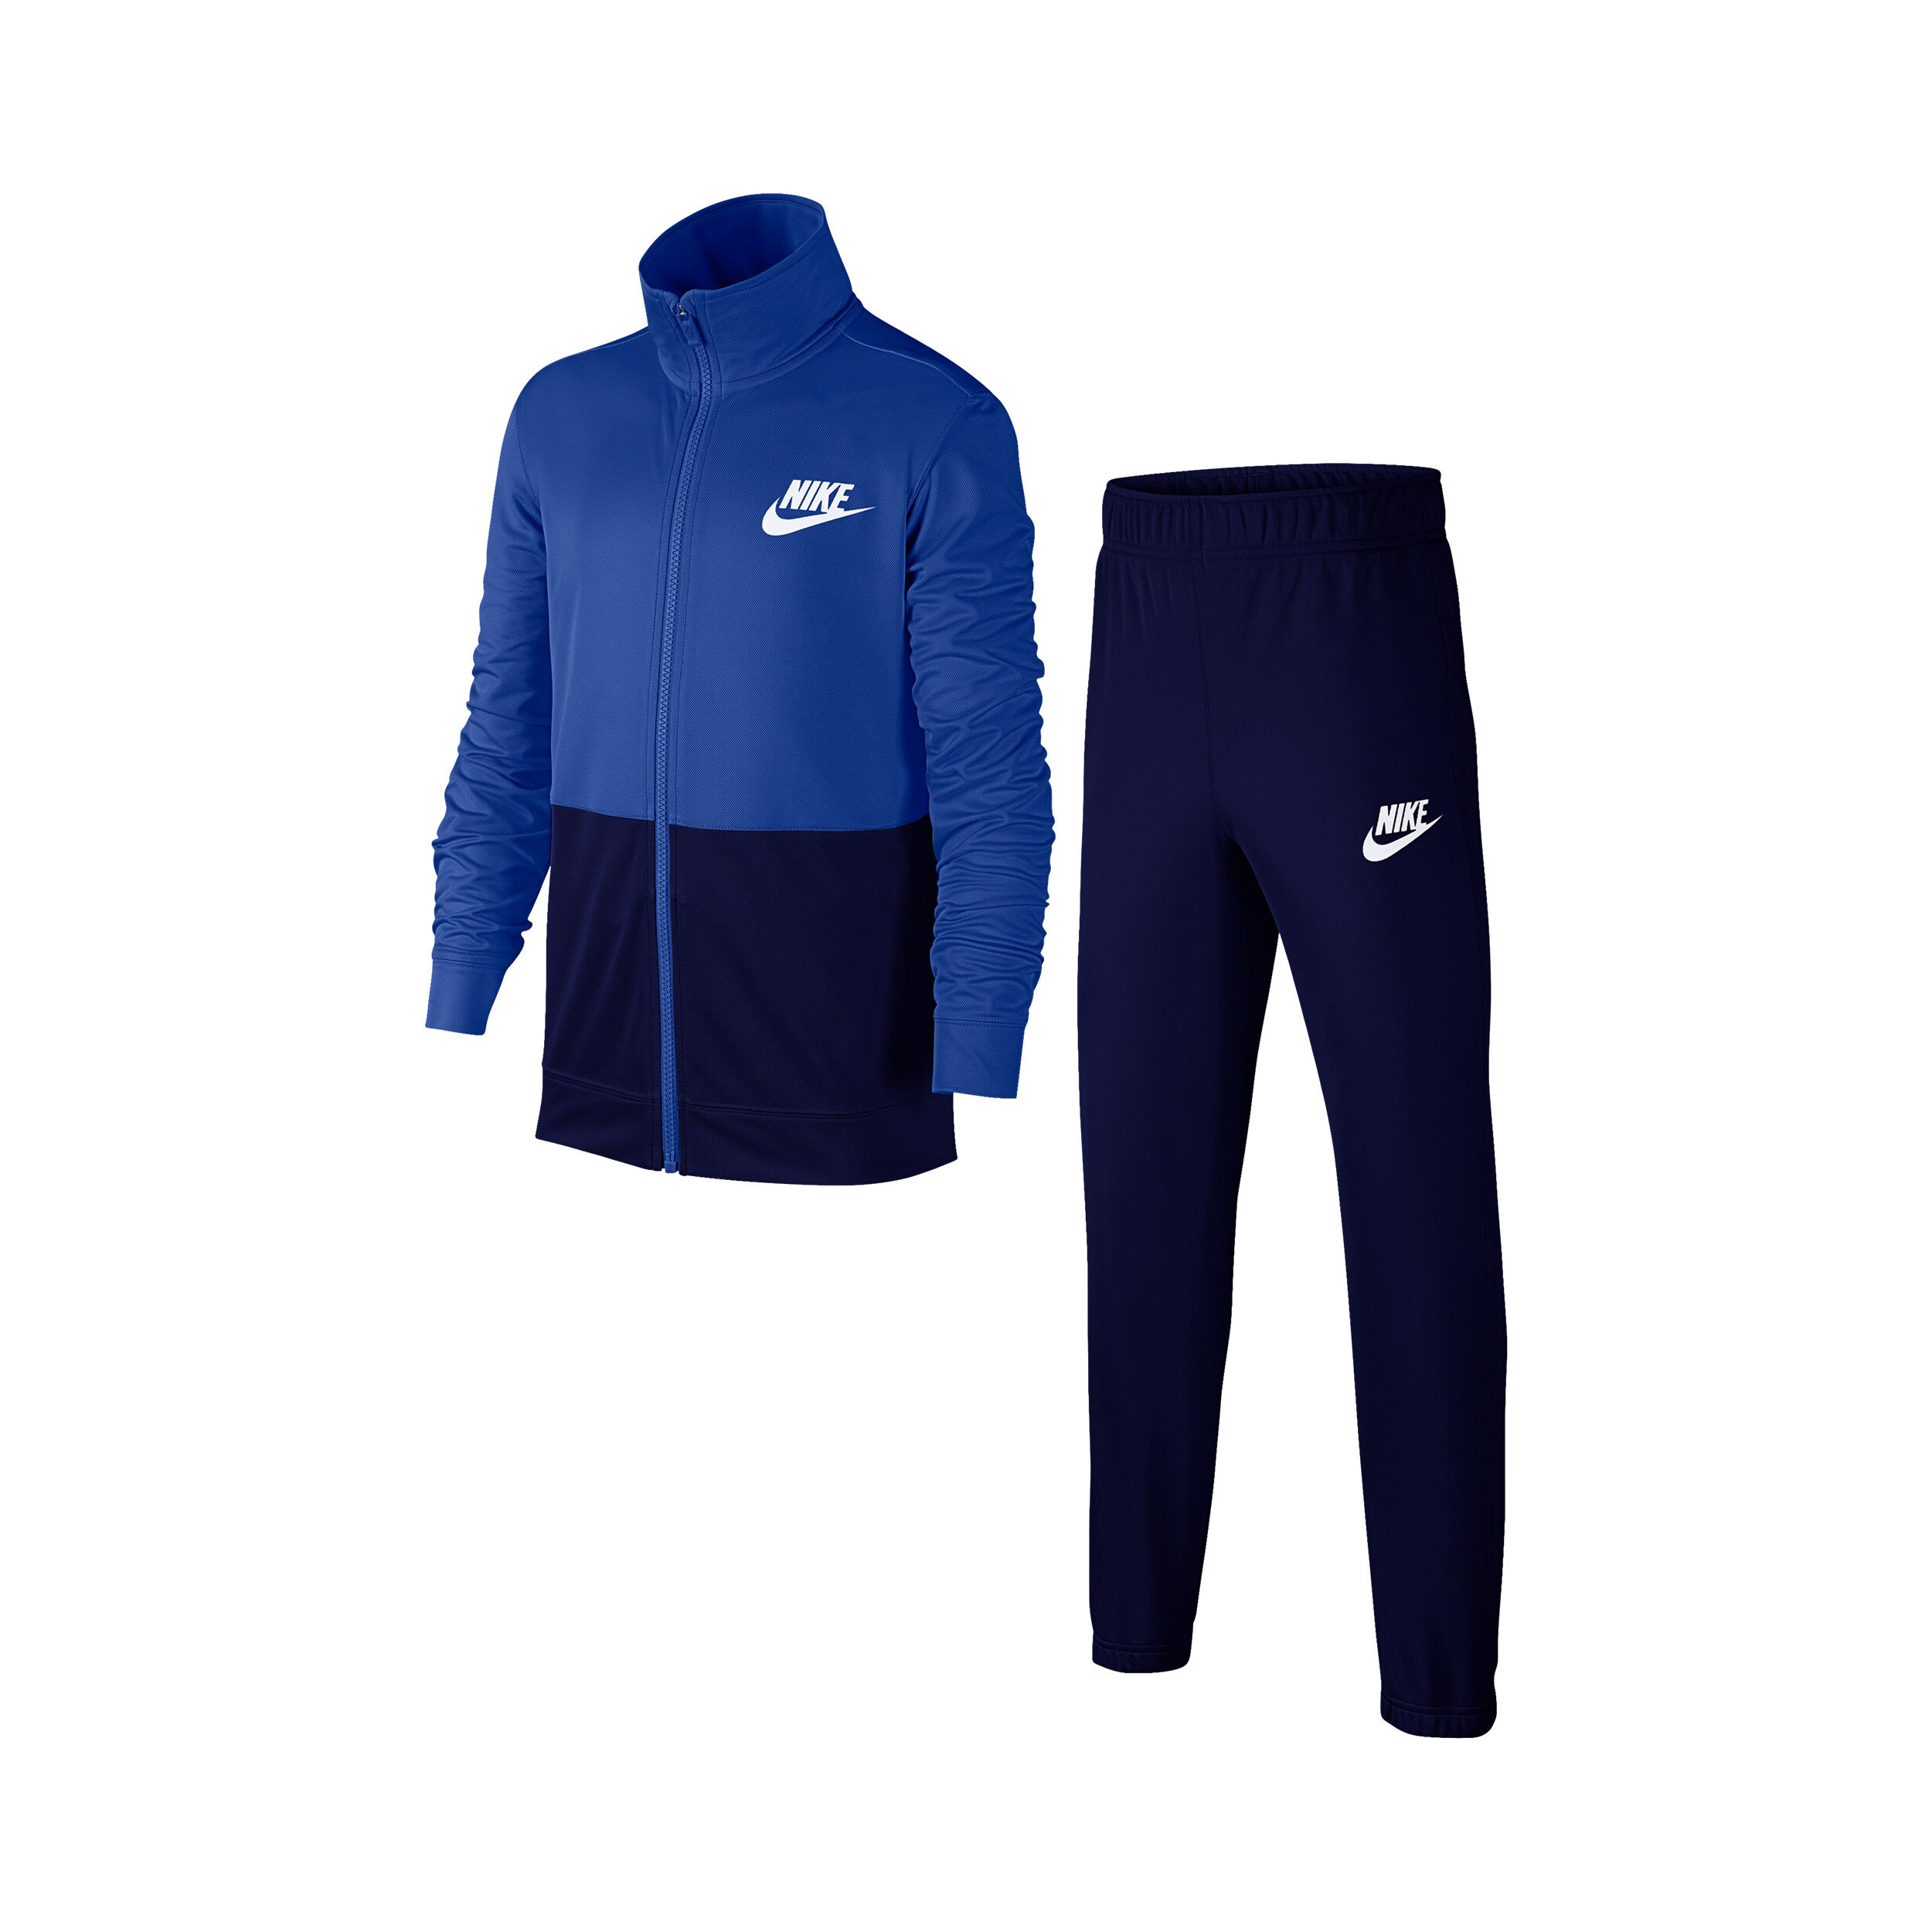 Nike Sportswear Trainingsanzug Jungen Blau, Schwarz